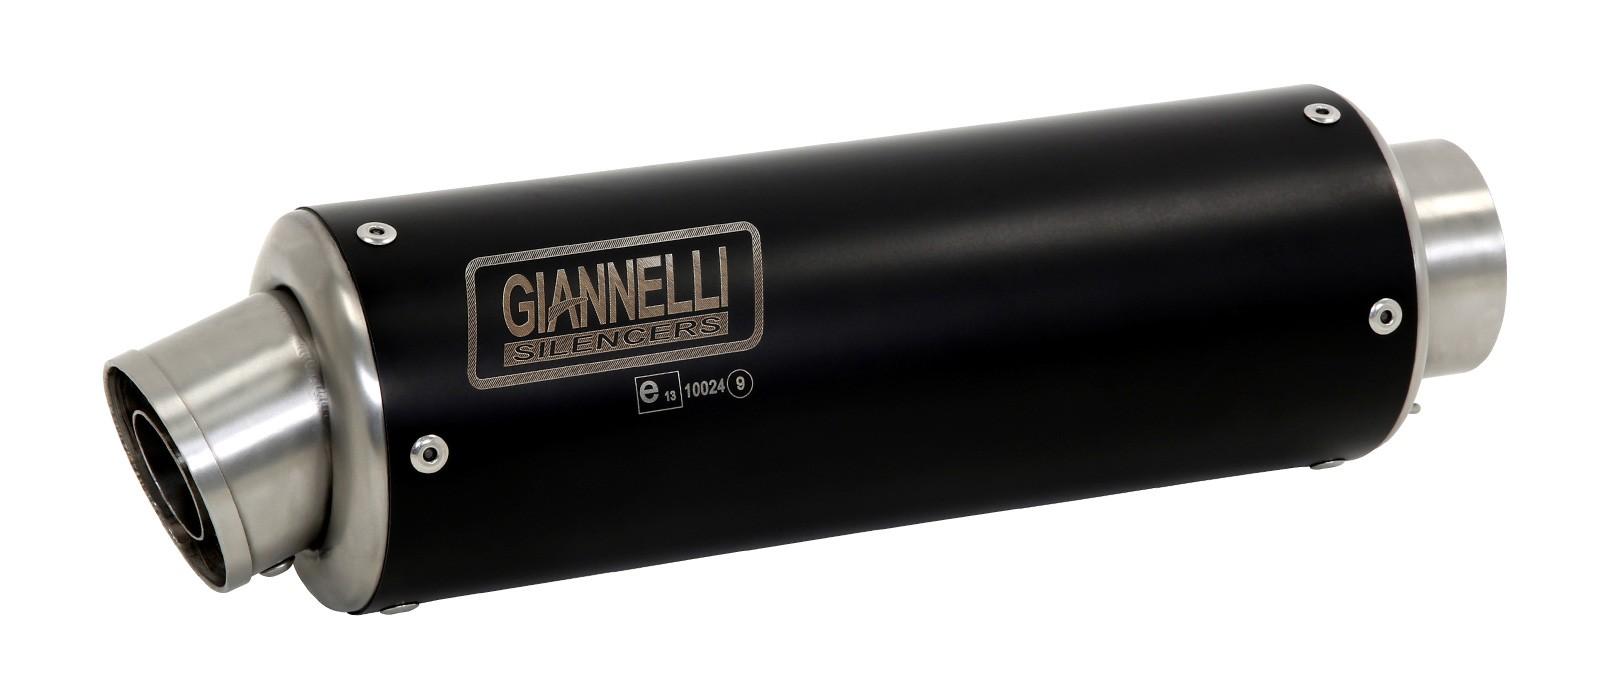 ESCAPES GIANNELLI HONDA - Sistema completo nicrom black X-PRO Honda MSX 125 Giannelli 73571XP -